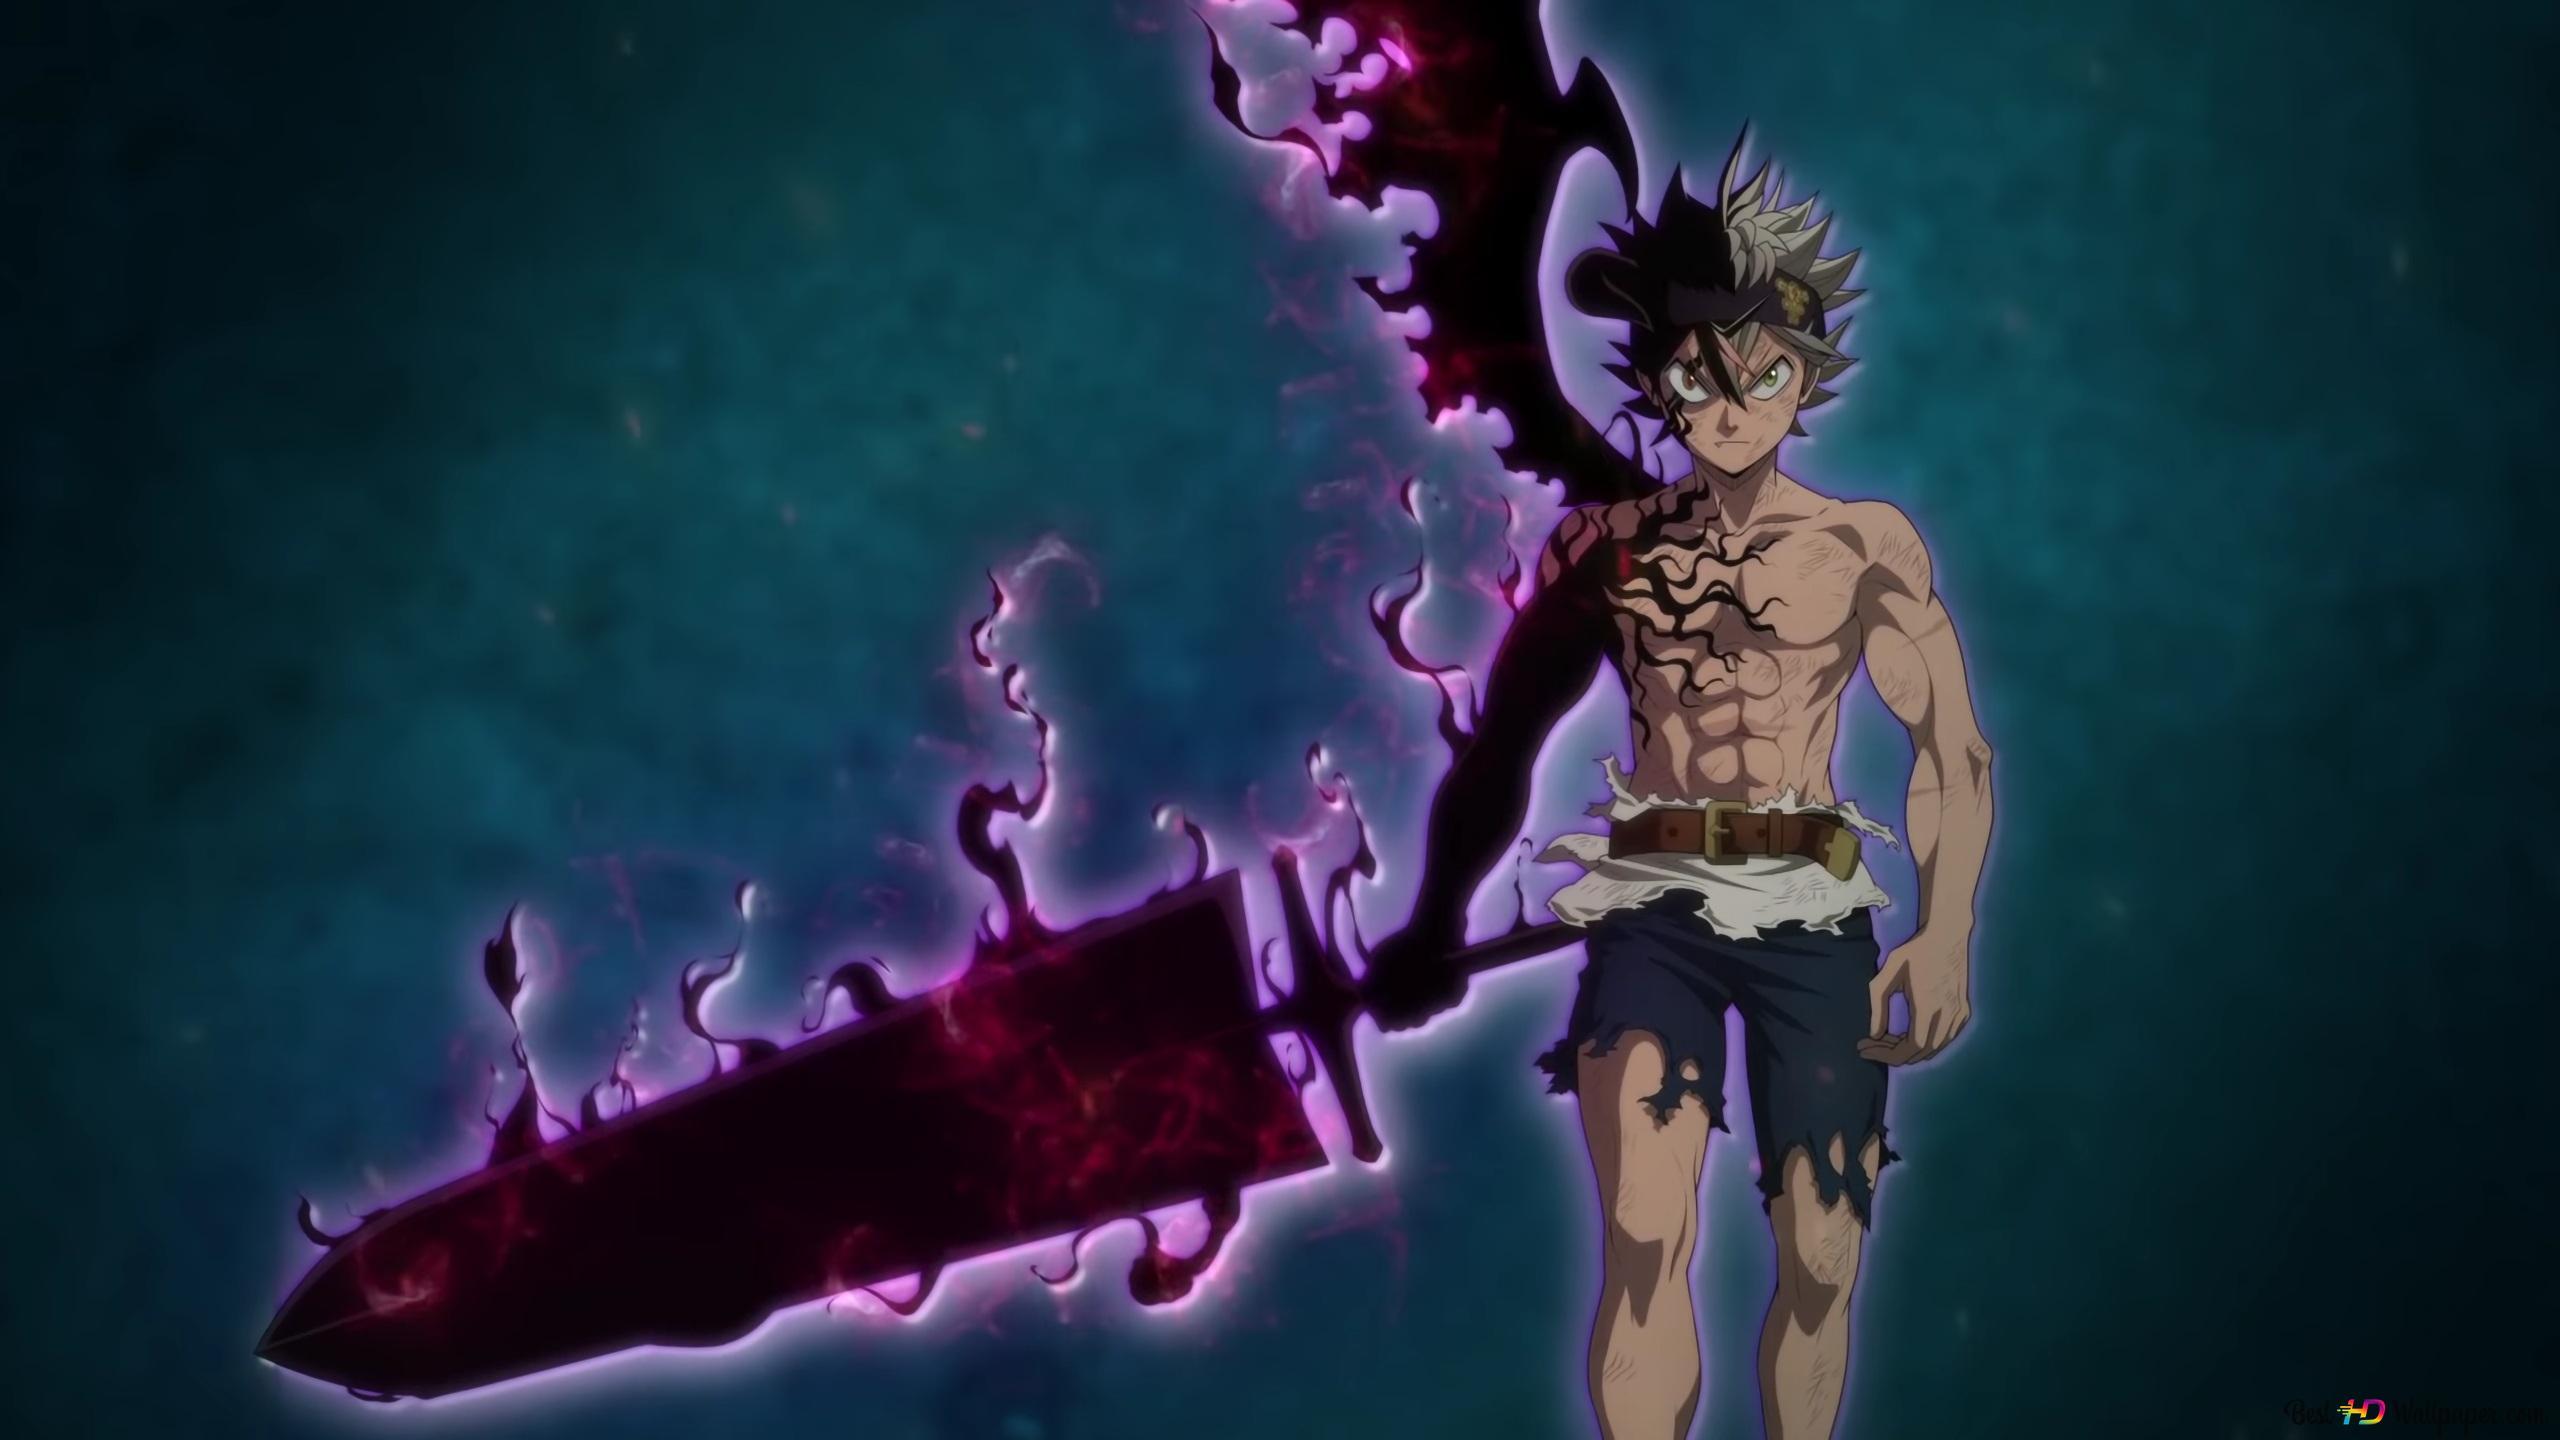 Black Clover Asta Demon Sword Hd Wallpaper Download